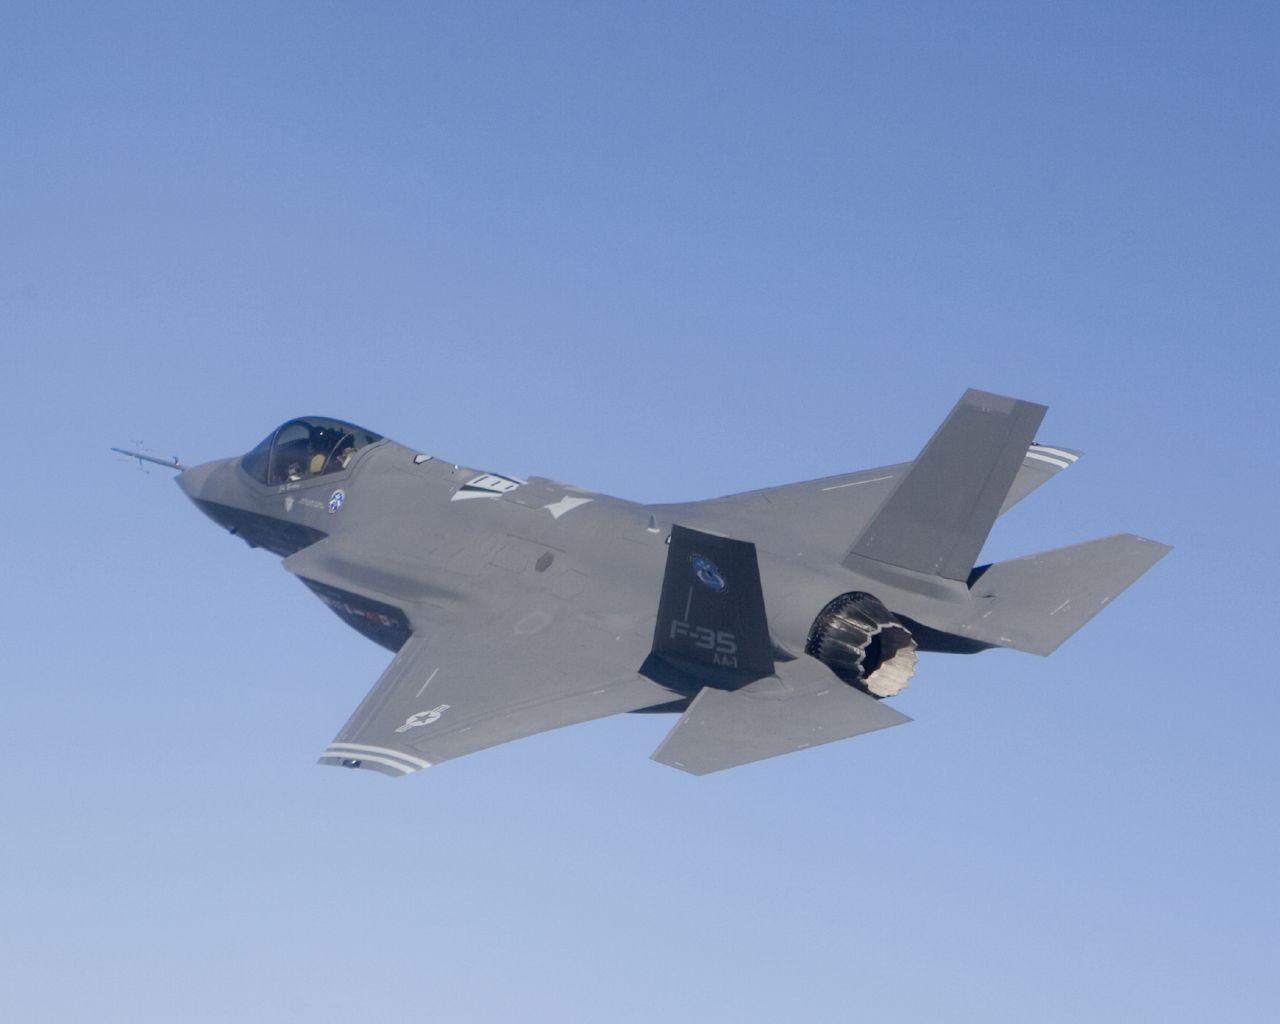 t50/pak fa  ليست شبحيه حتى الان بالتحليل والصور والمصادر  - صفحة 2 F-35_JSF_2